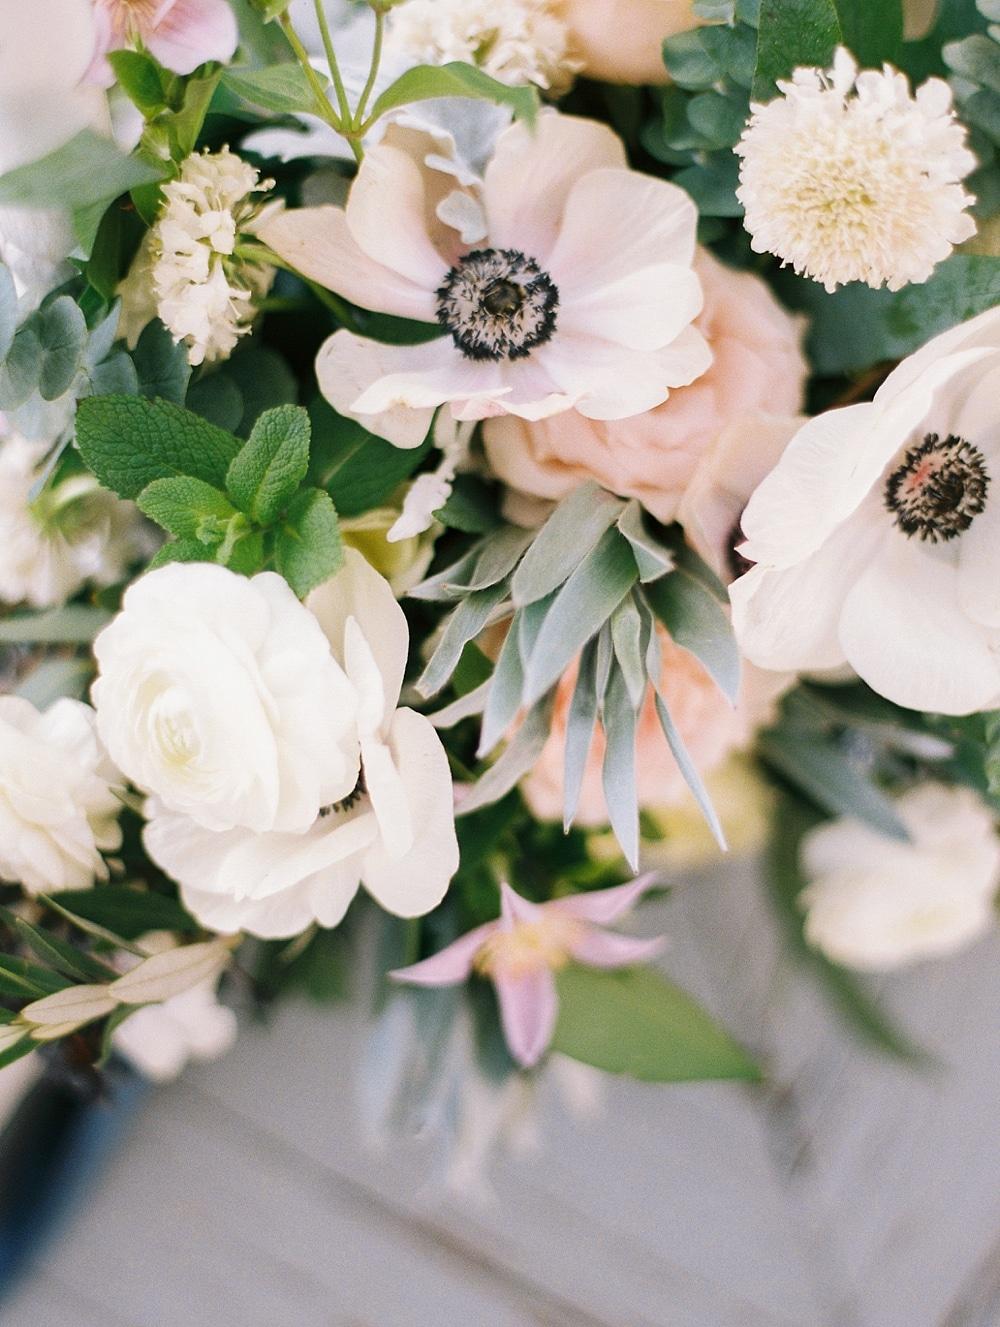 Kristin-La-Voie-Photography-Austin-Wedding-Photographer-barr-mansion (22 of 86)